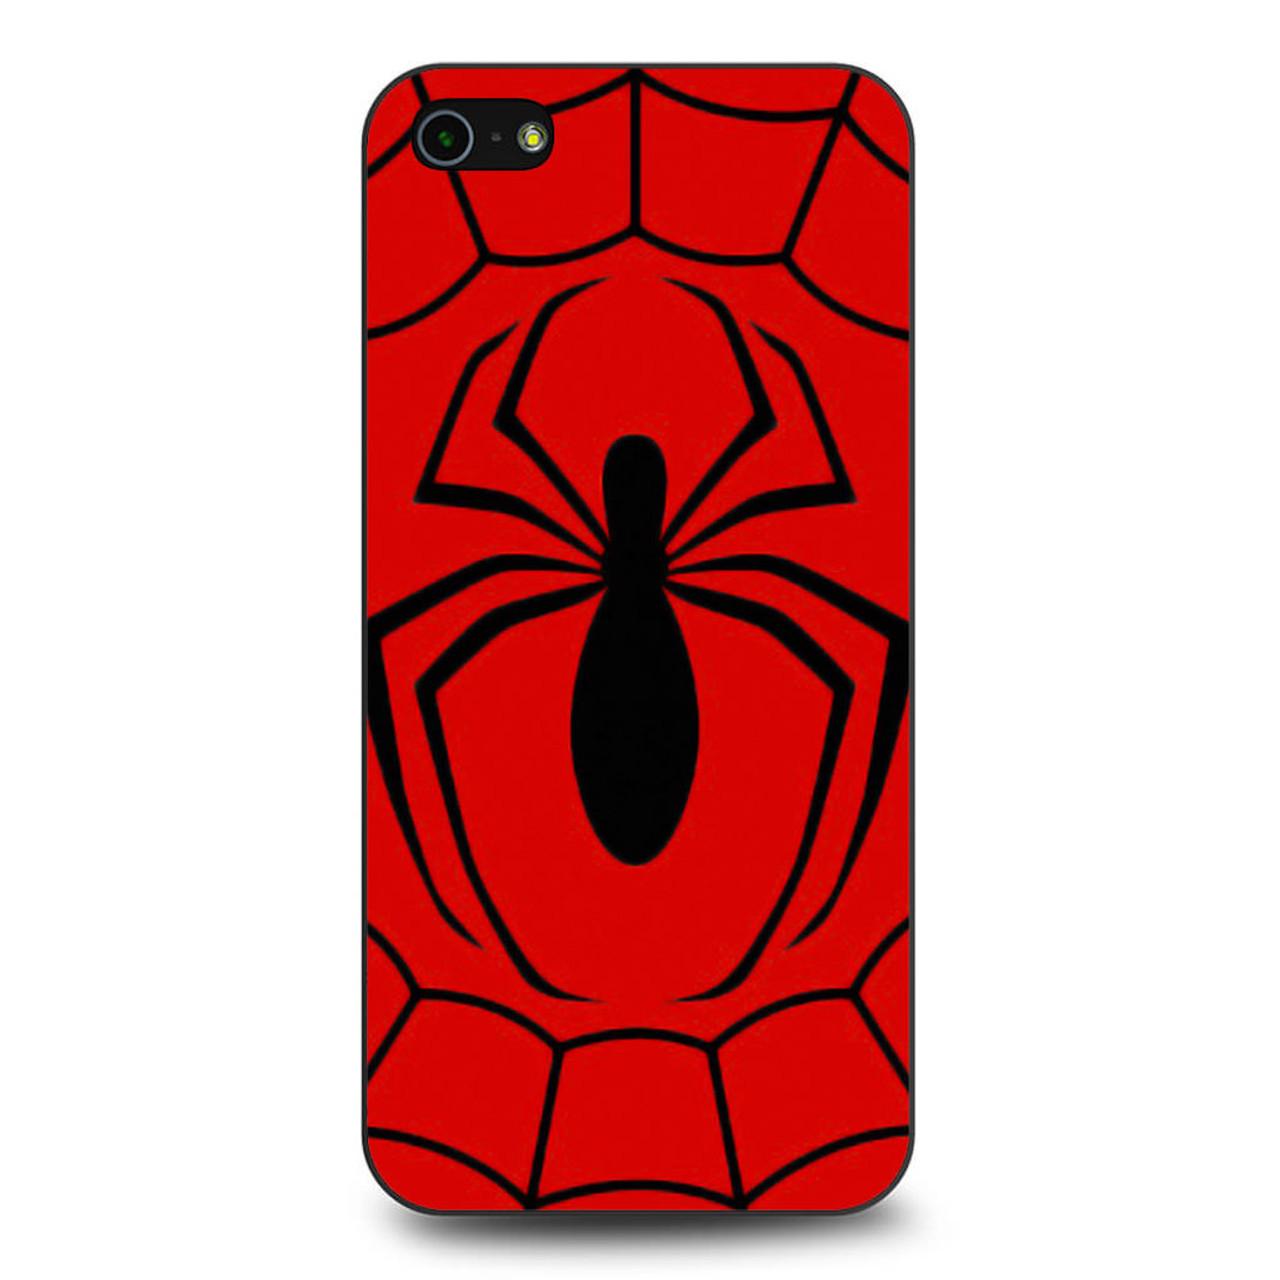 Spiderman Symbol Iphone 55sse Case Caseshunter